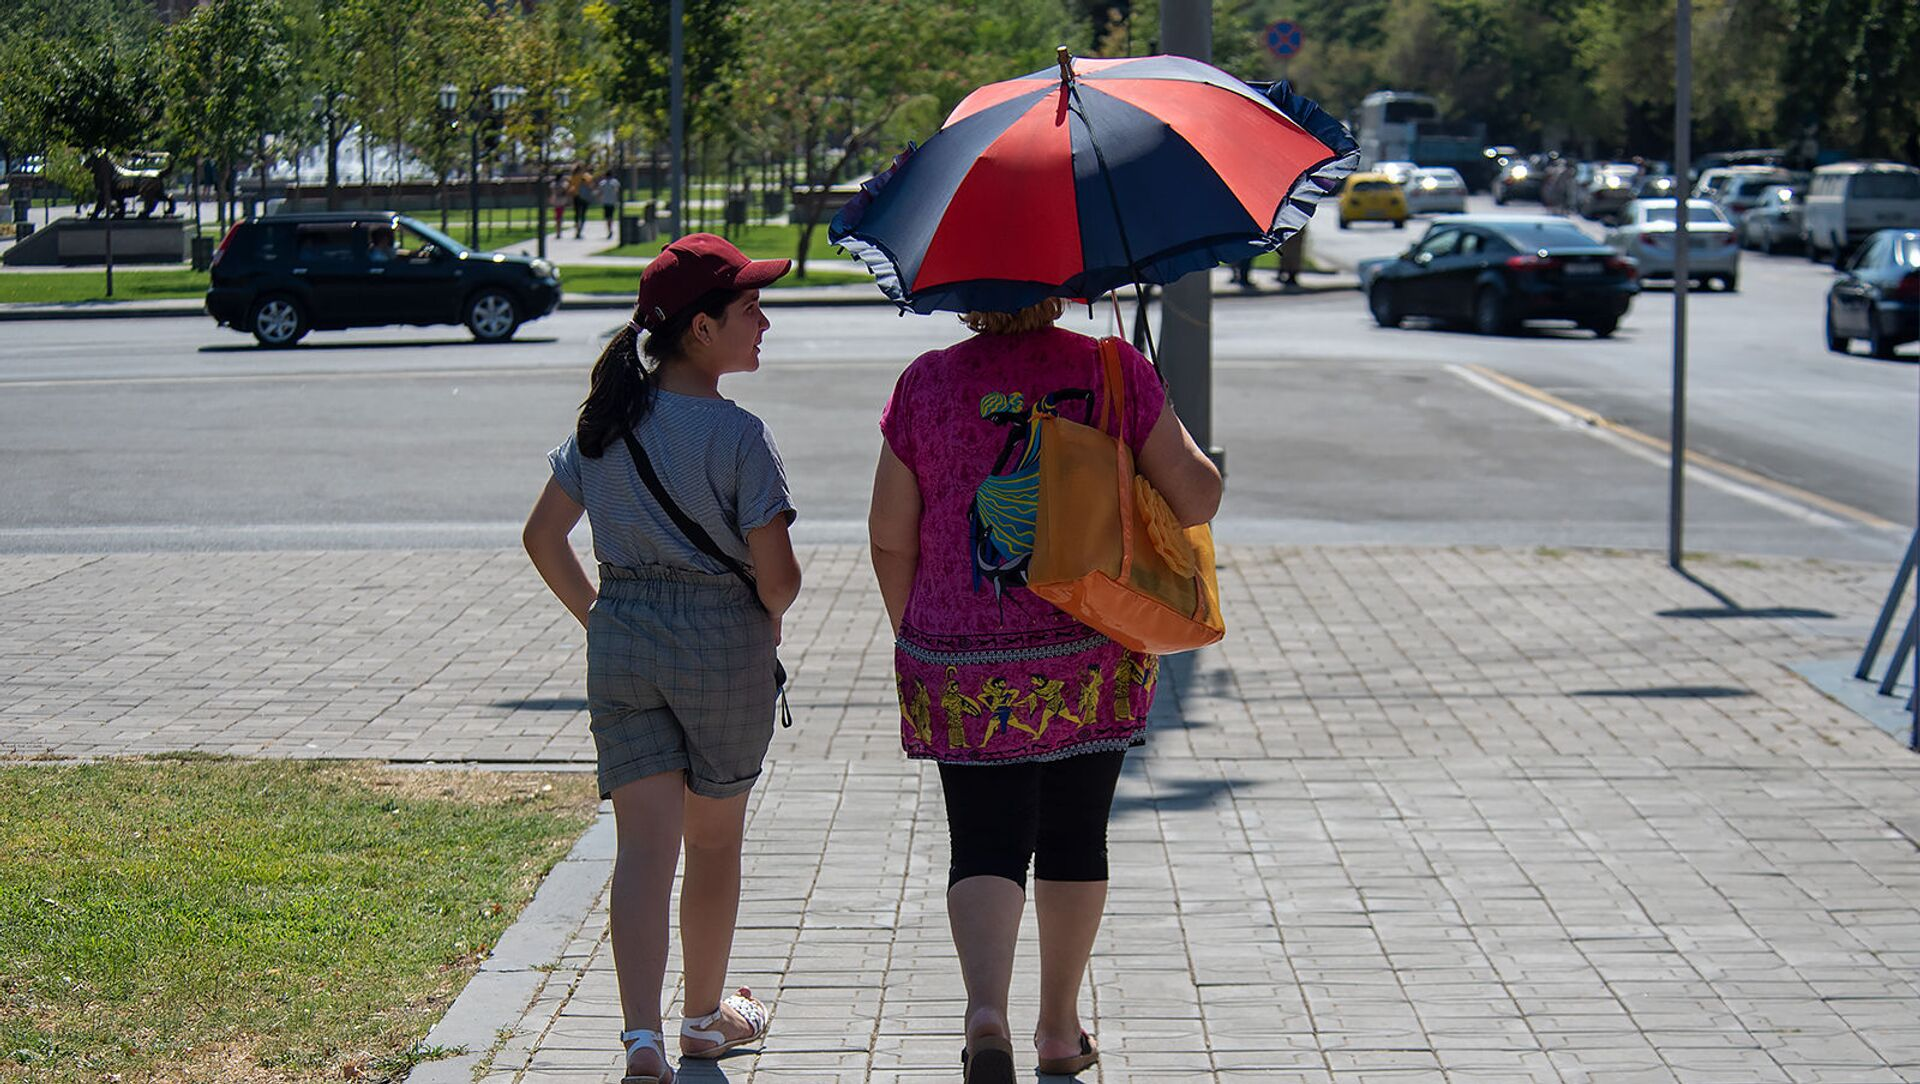 Люди на улицах Еревана в невыносимую жару - Sputnik Արմենիա, 1920, 26.08.2021